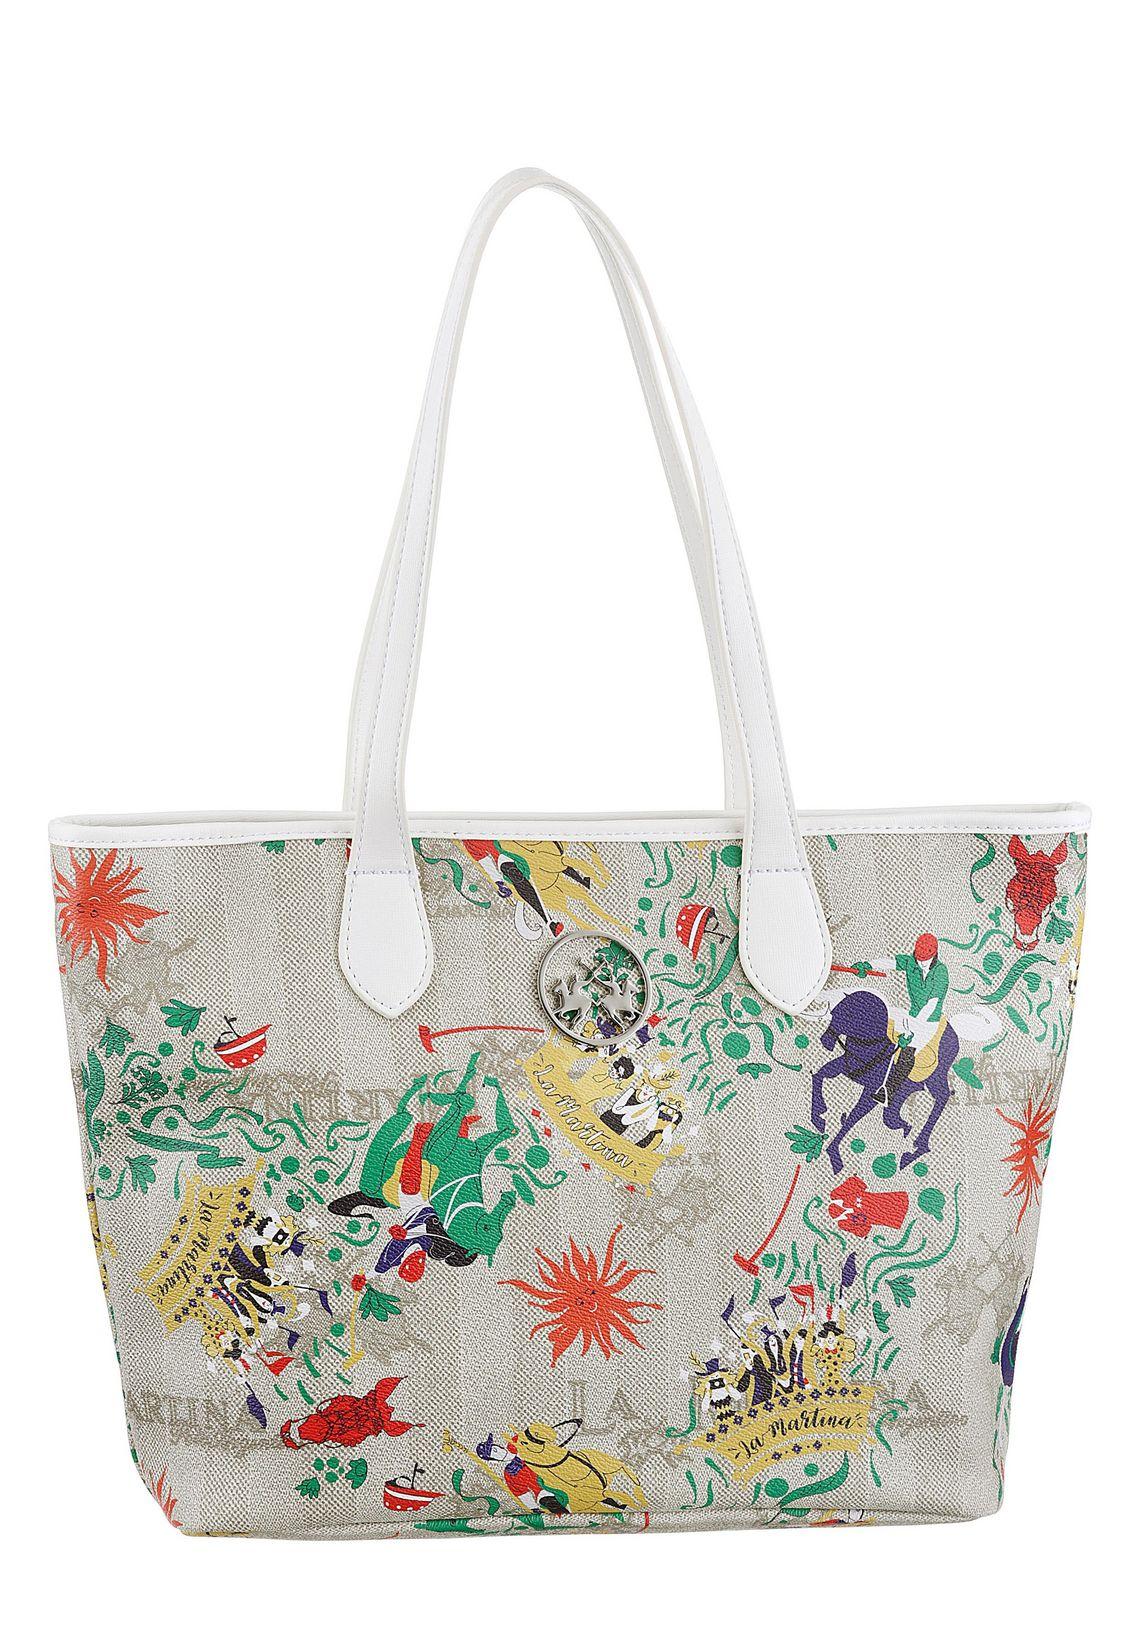 La Martina Shopper Mariana Online Shop Multicolour mm8asRFa